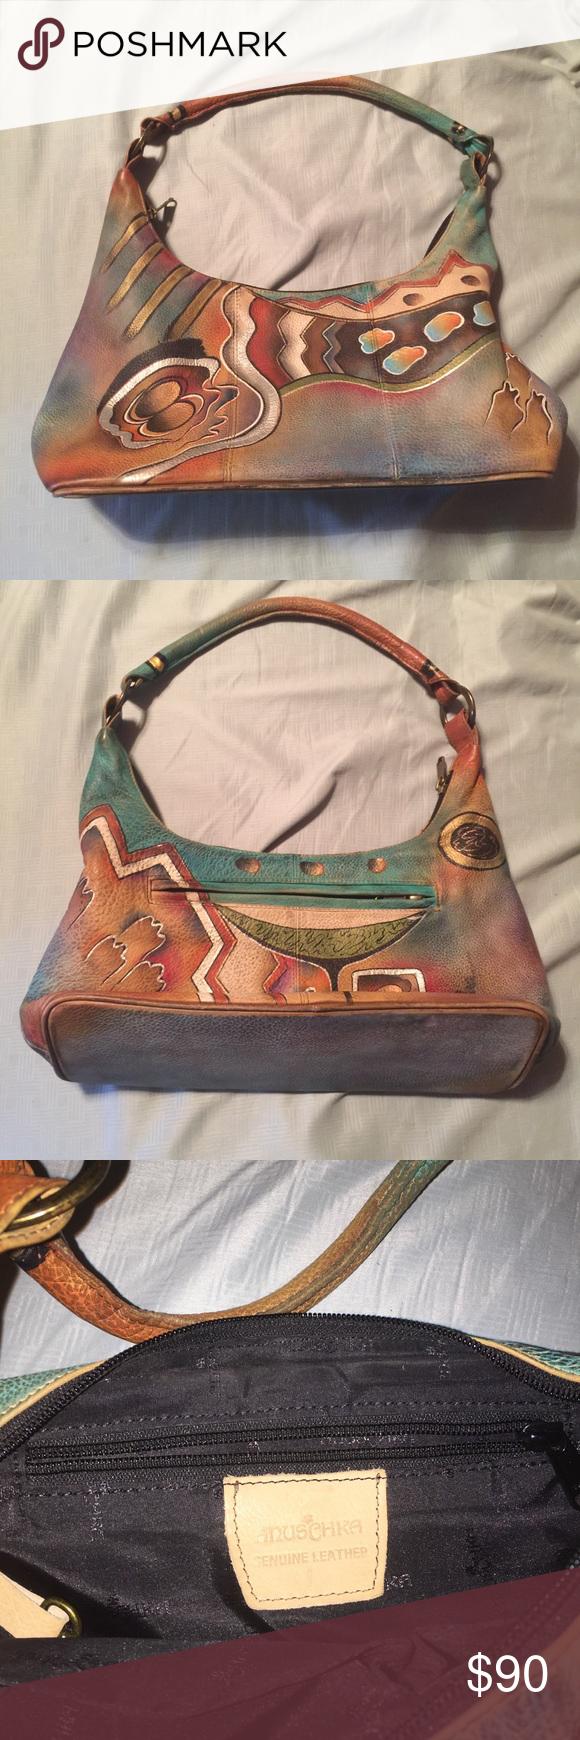 Anuschka Hand-painted Purse Beautiful hand-painted genuine leather Anuschka  purse. Very good used condition. Anuschka Bags 48a522e4c2